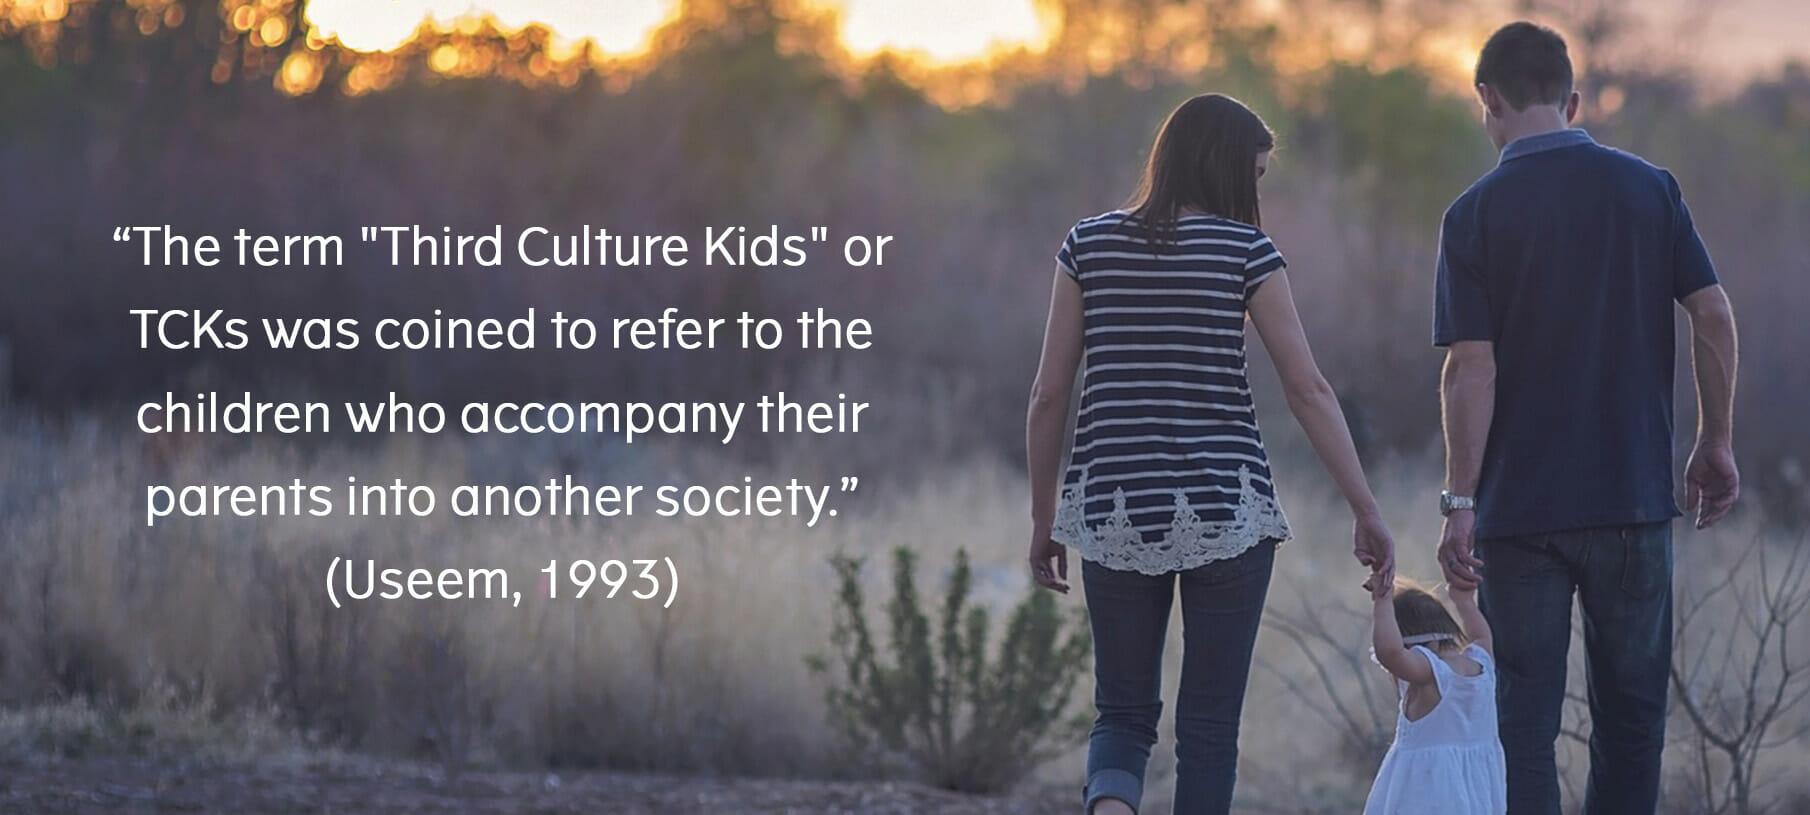 definition af TCK / third culture kids - danes worldwide.